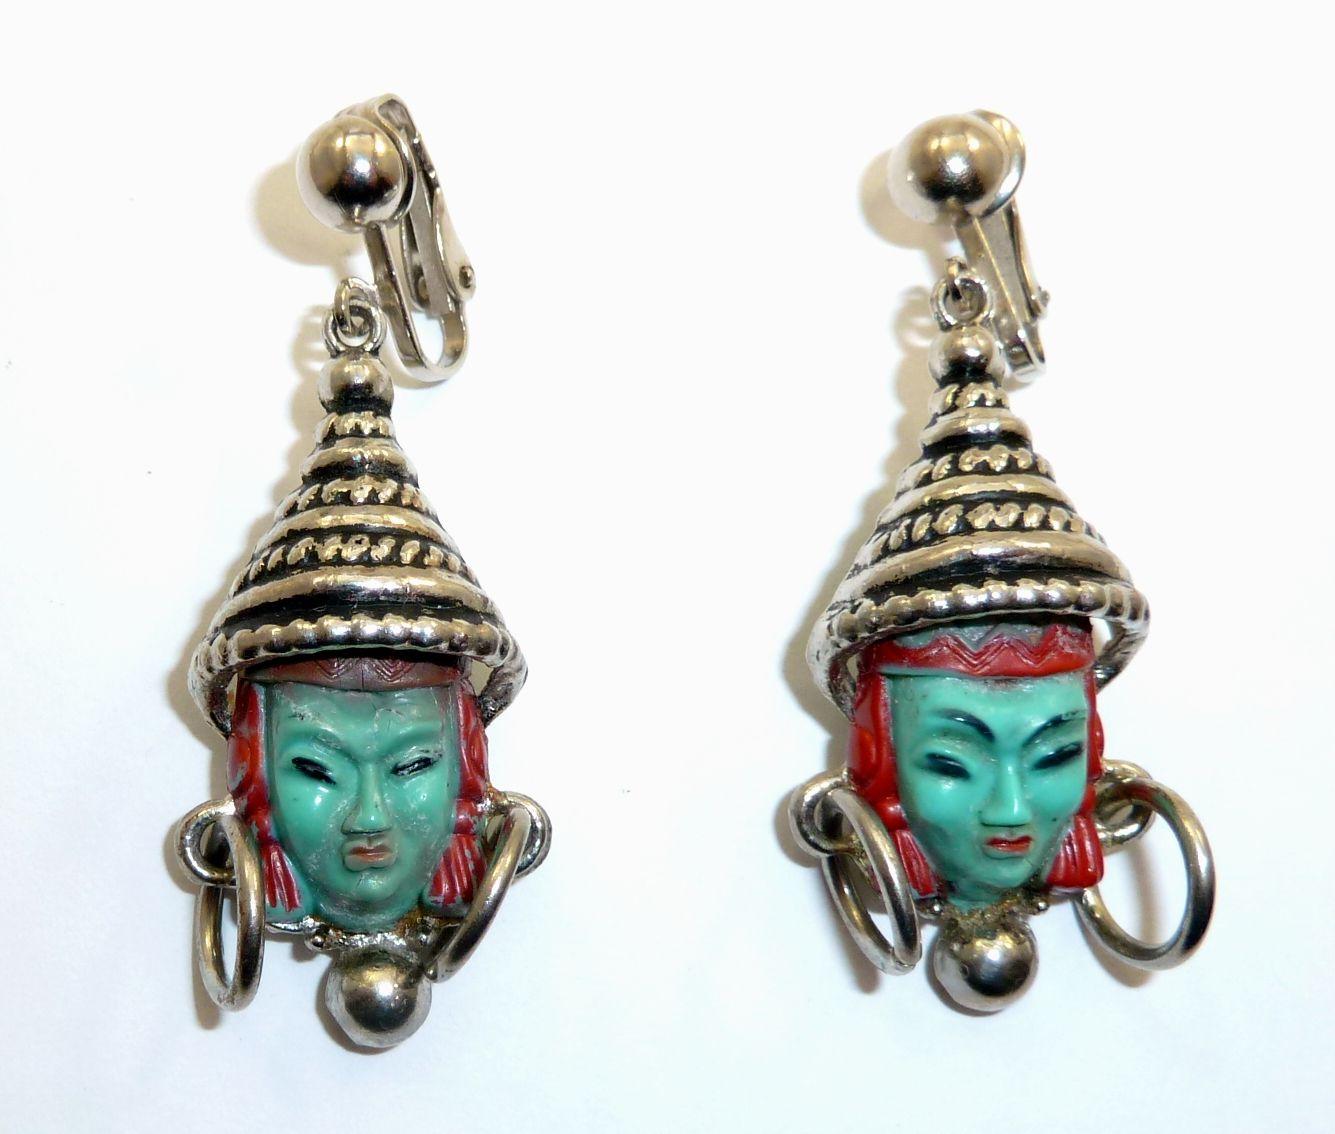 Unmarked Selro/Selini Thai Princess clip earrings.  Photographed by Gillian Horsup.  www.gillianhorsup.com